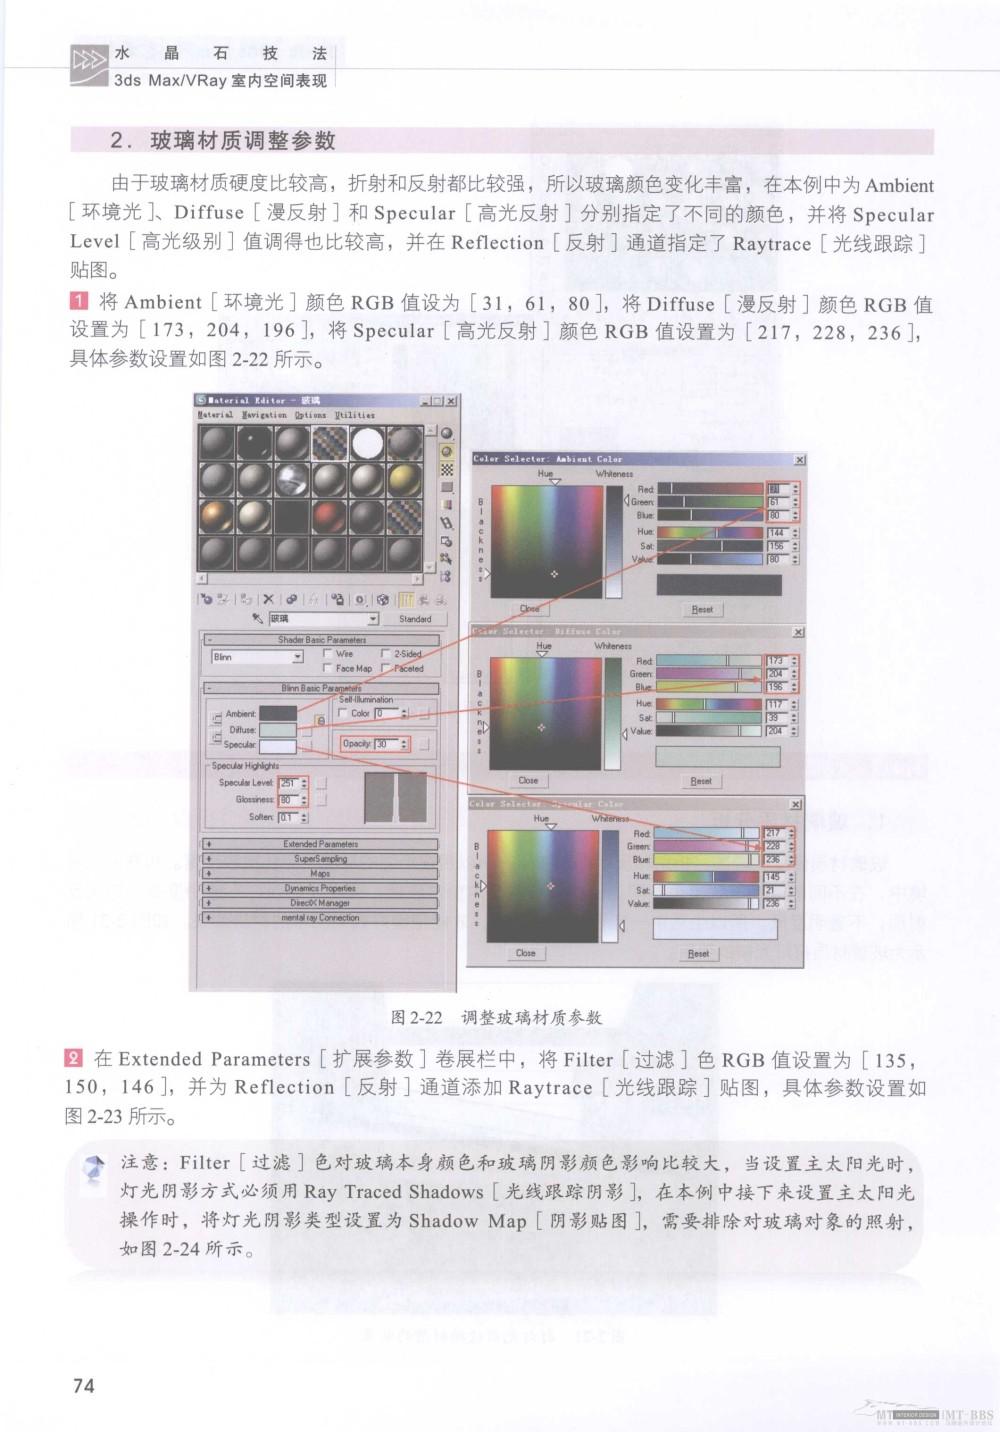 水晶石技法-3ds_Max&VRay室内空间表现_水晶石技法-3ds_Max&VRay室内空间表现_页面_080.jpg